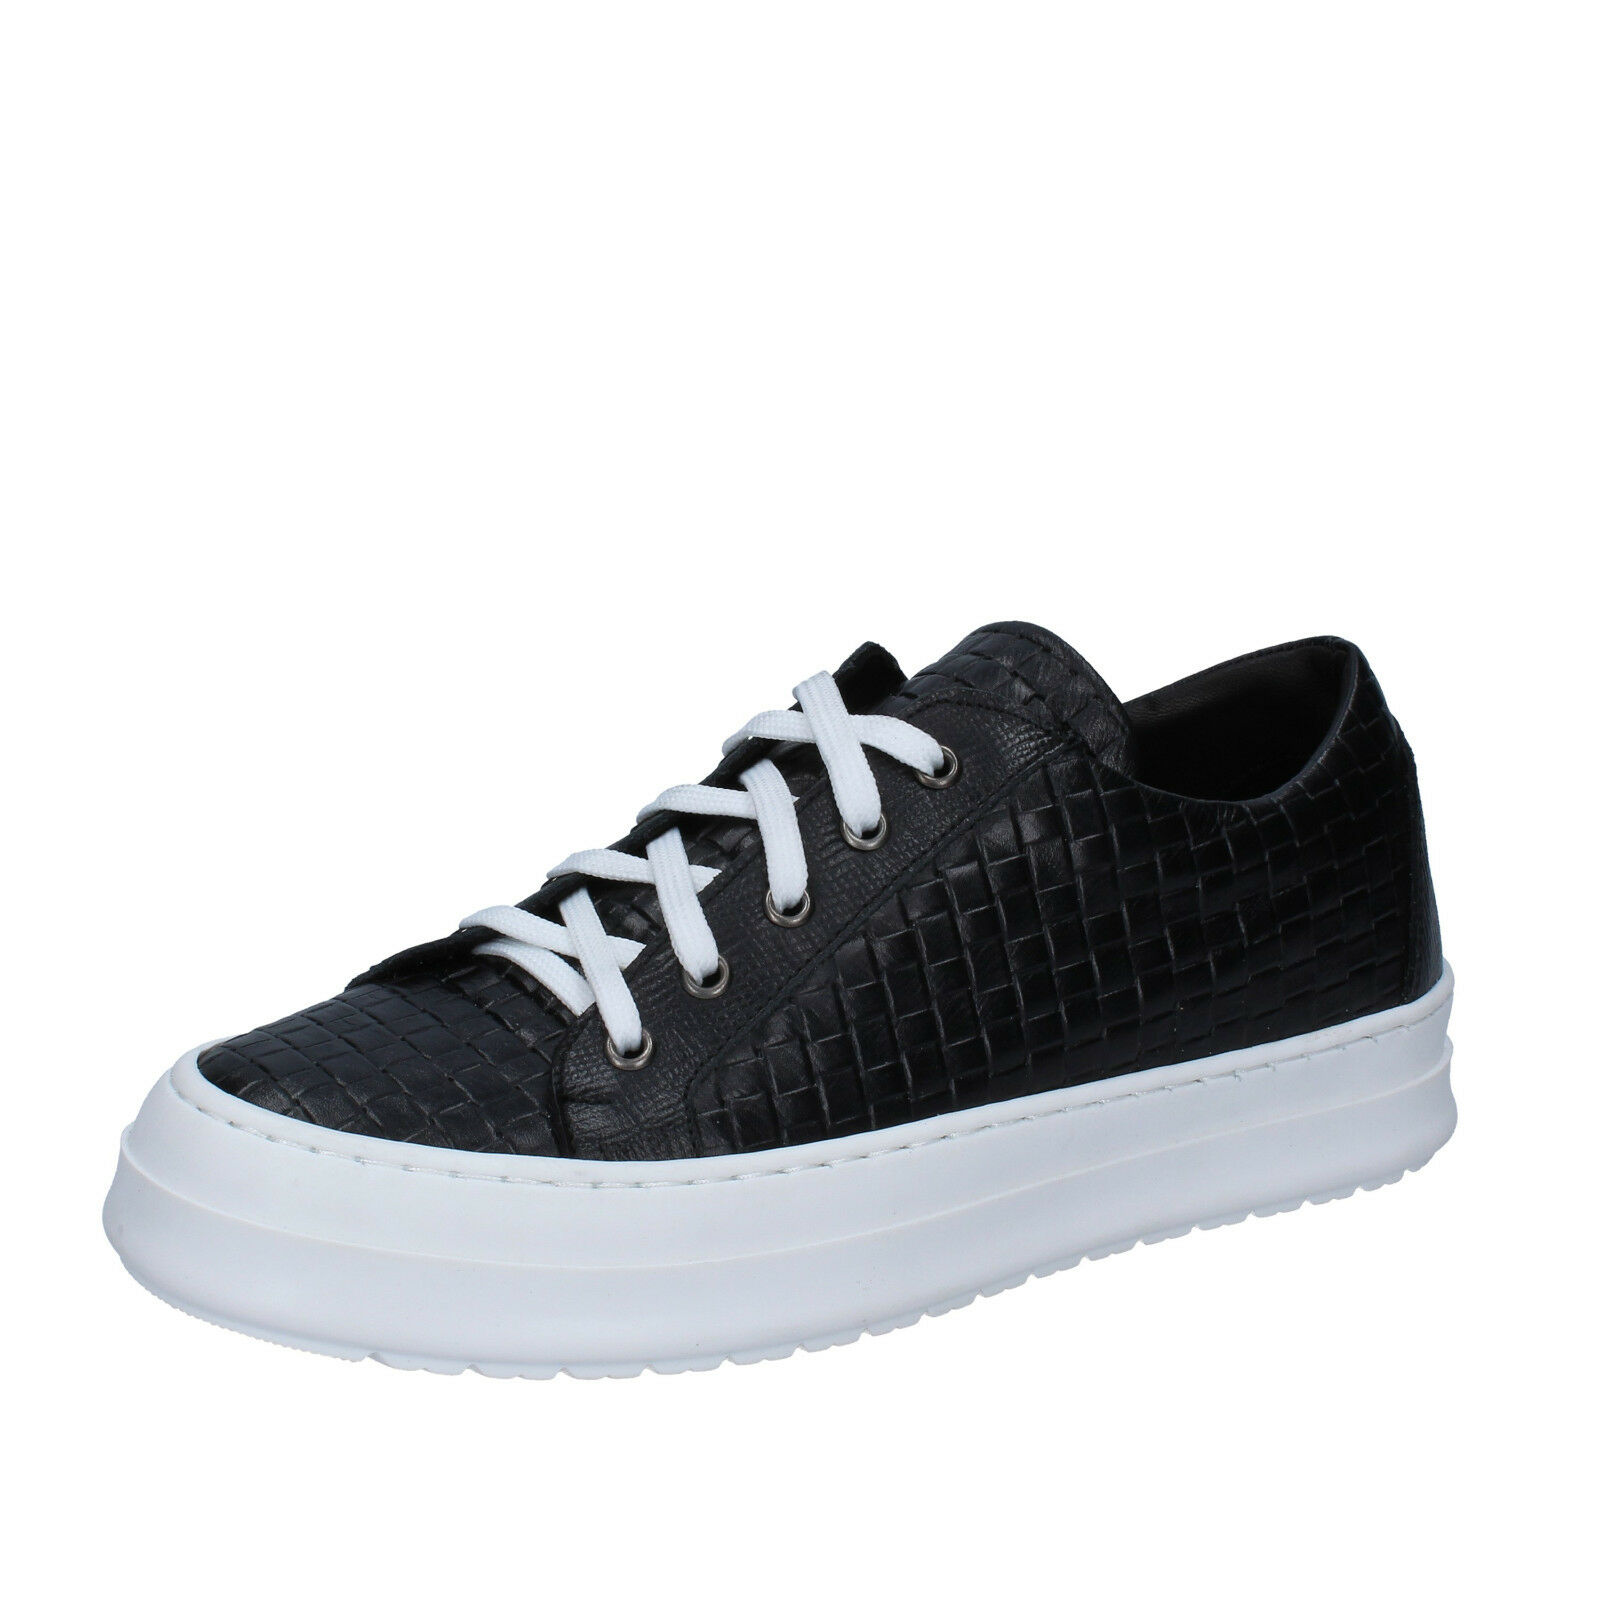 marchio famoso Scarpe uomo FDF scarpe 42 EU EU EU scarpe da ginnastica nero pelle BZ677-D  vendita di offerte